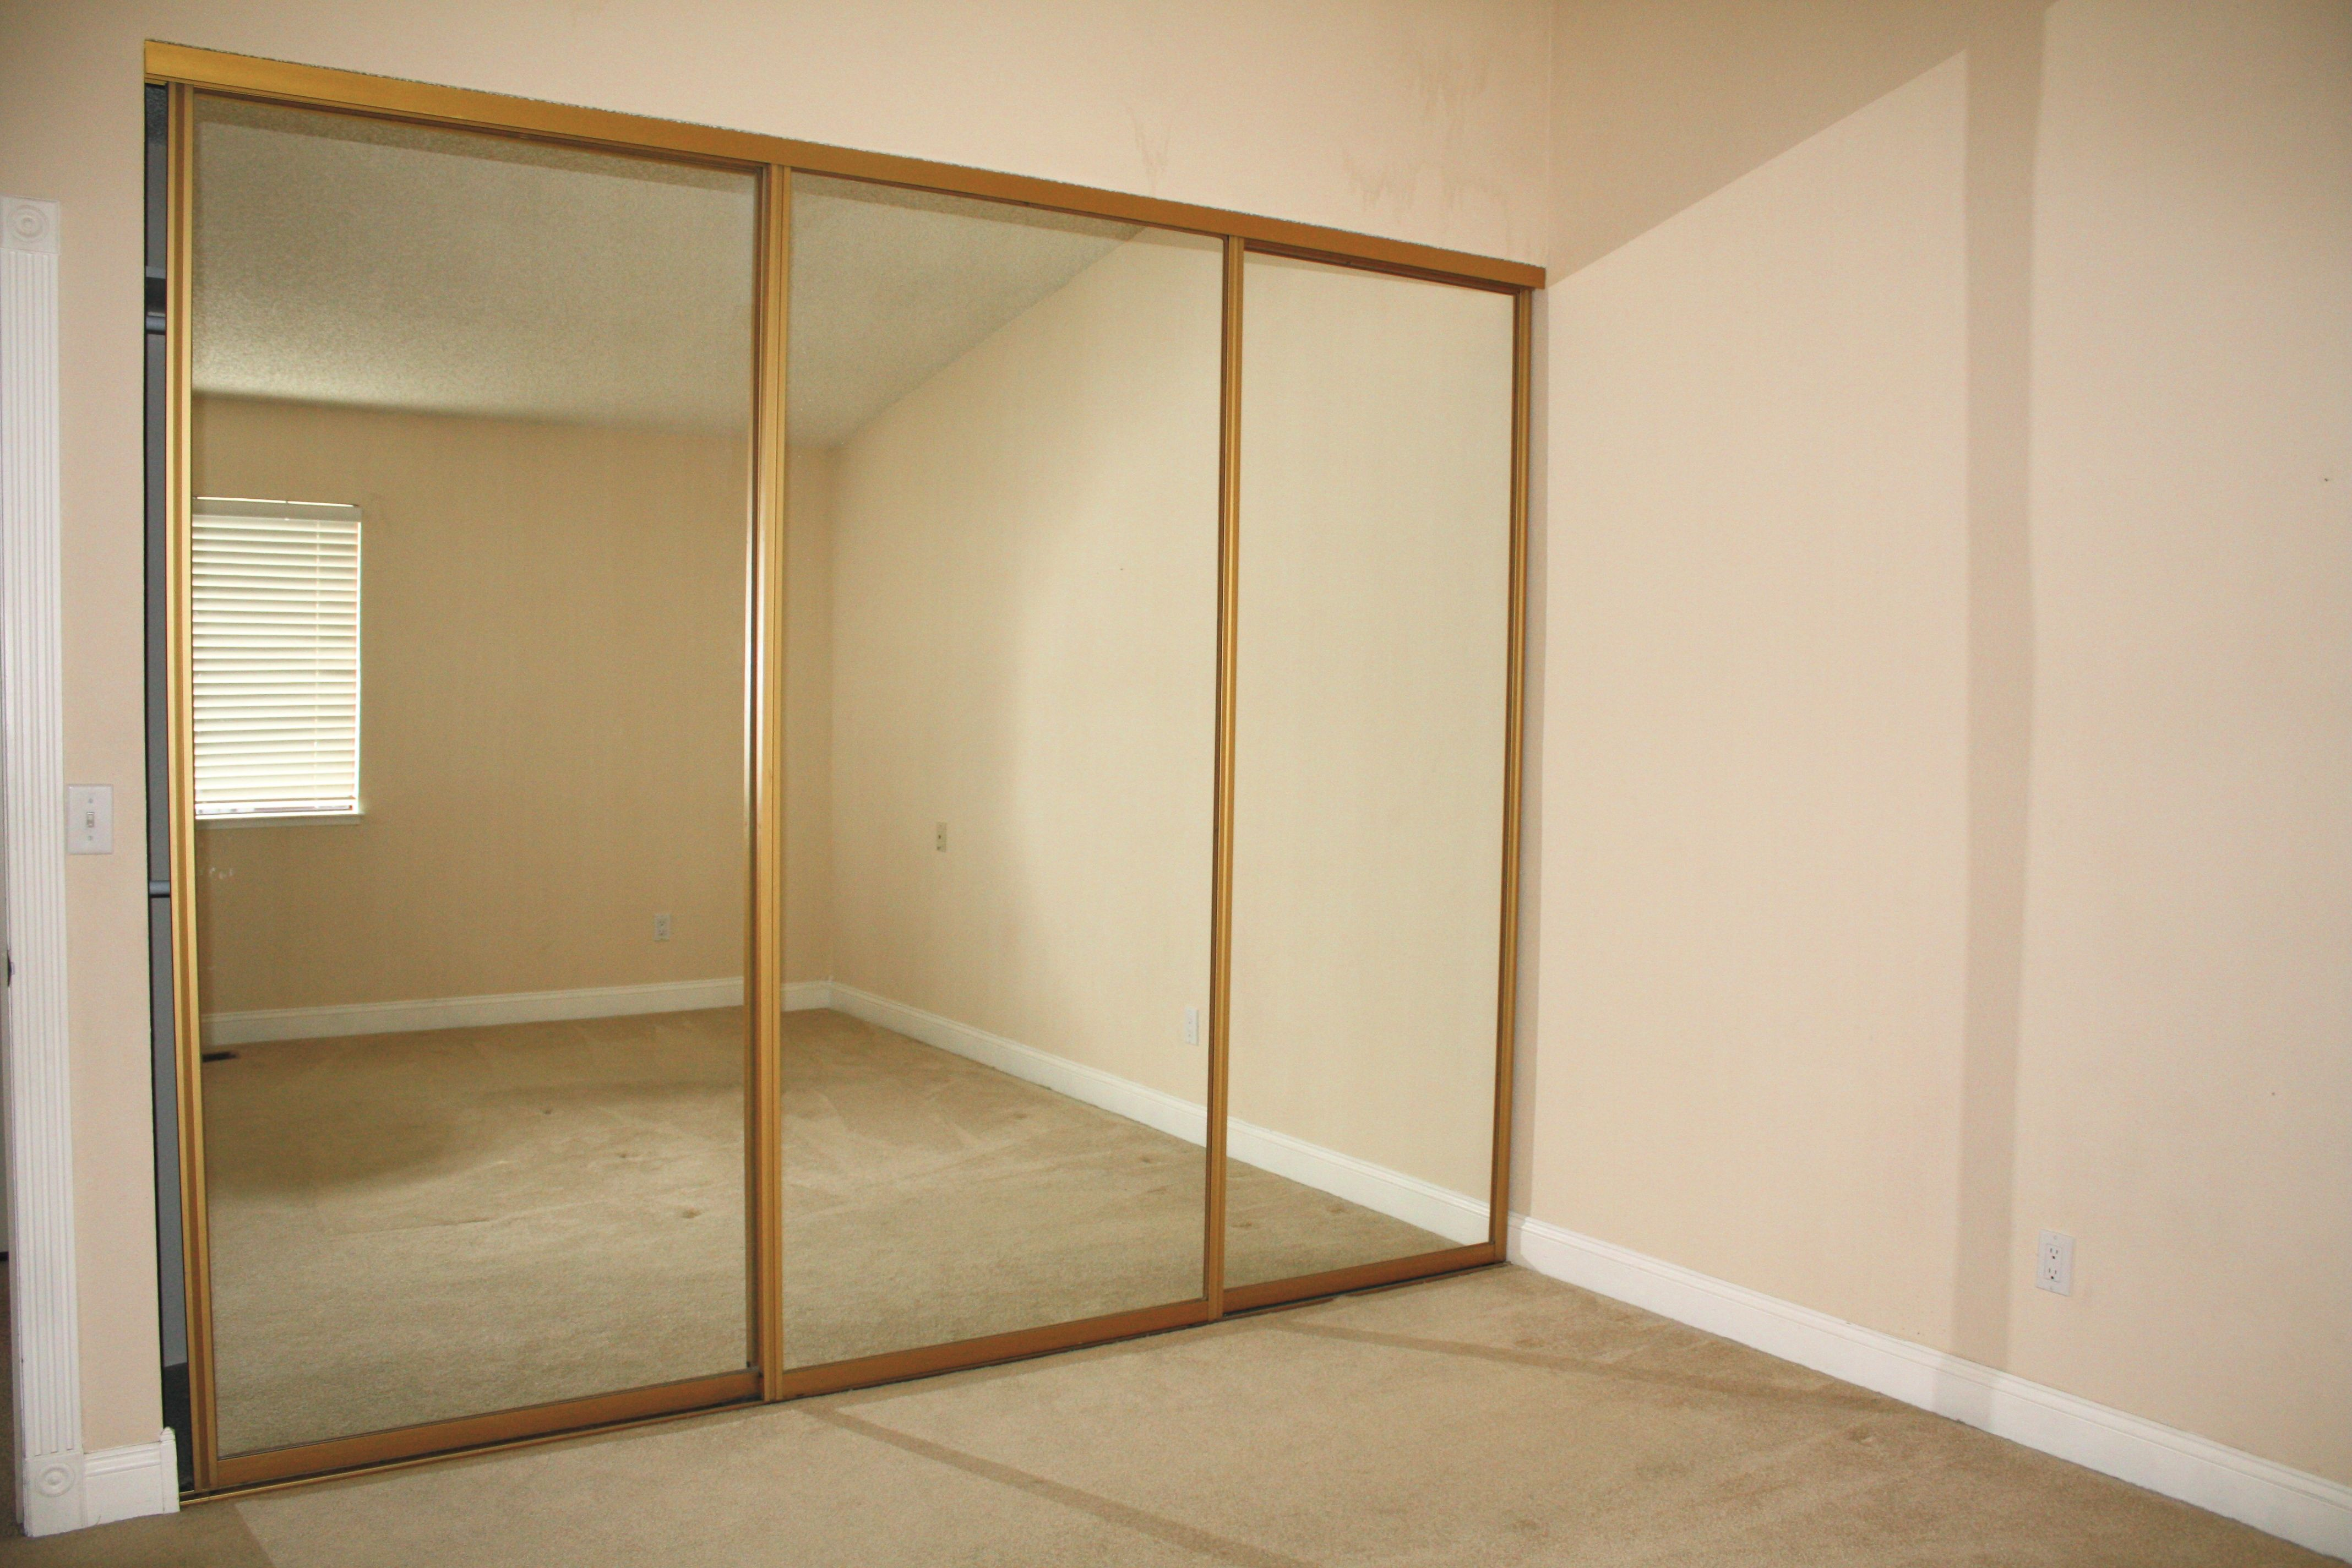 3 Panel Sliding Mirror Closet Doors Httptogethersandiacom